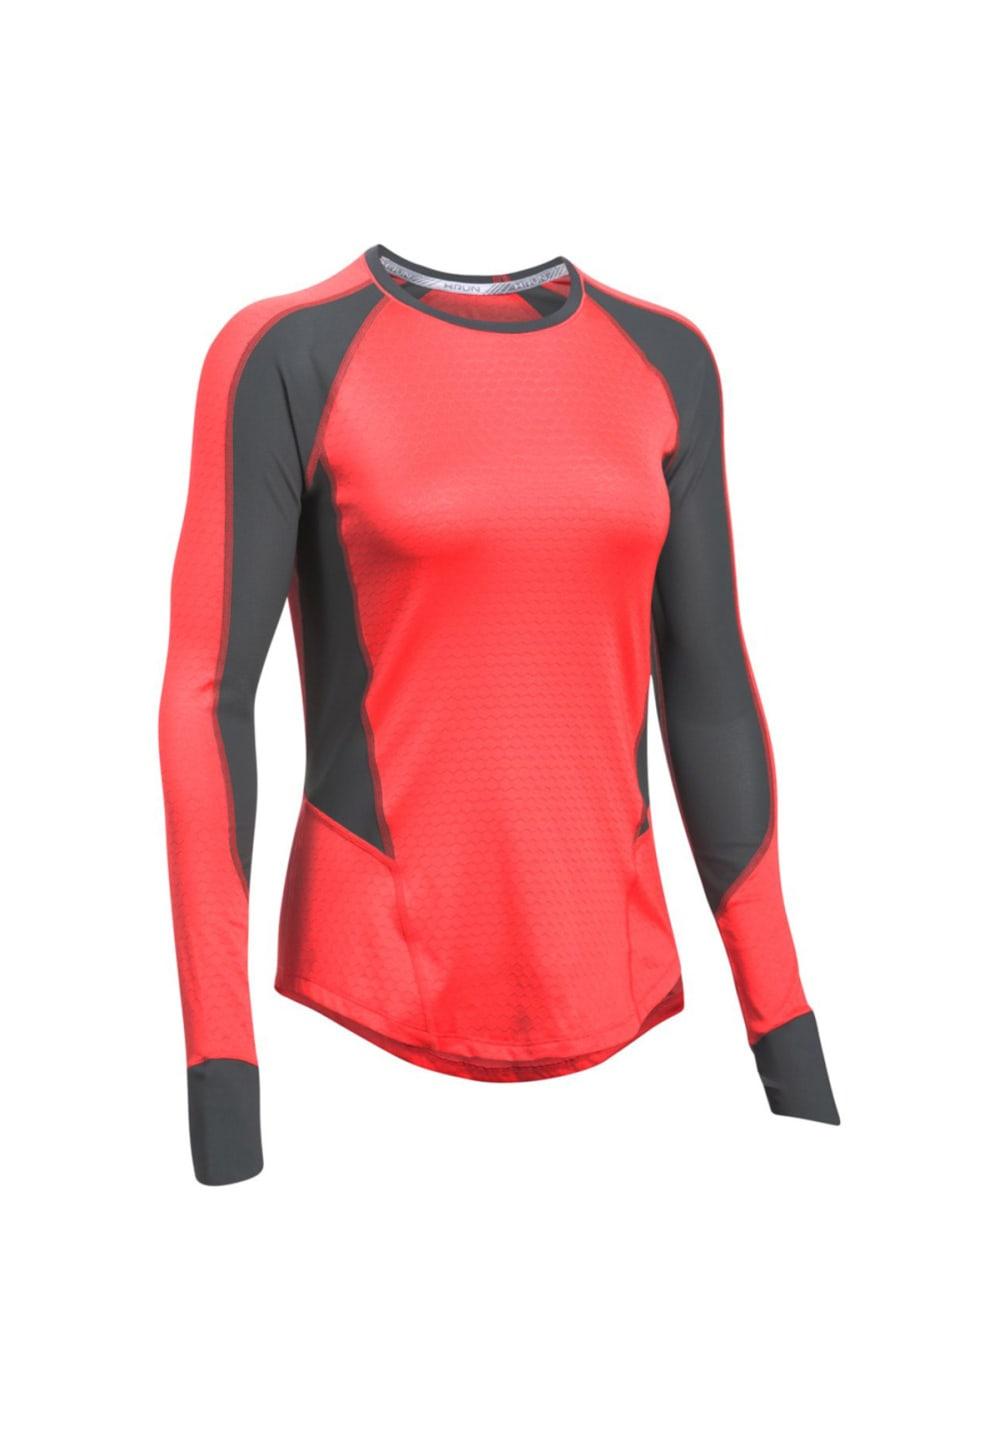 73e7c080 Under Armour Allseason Reactor Run Long Sleeve - Running tops for Women -  Pink